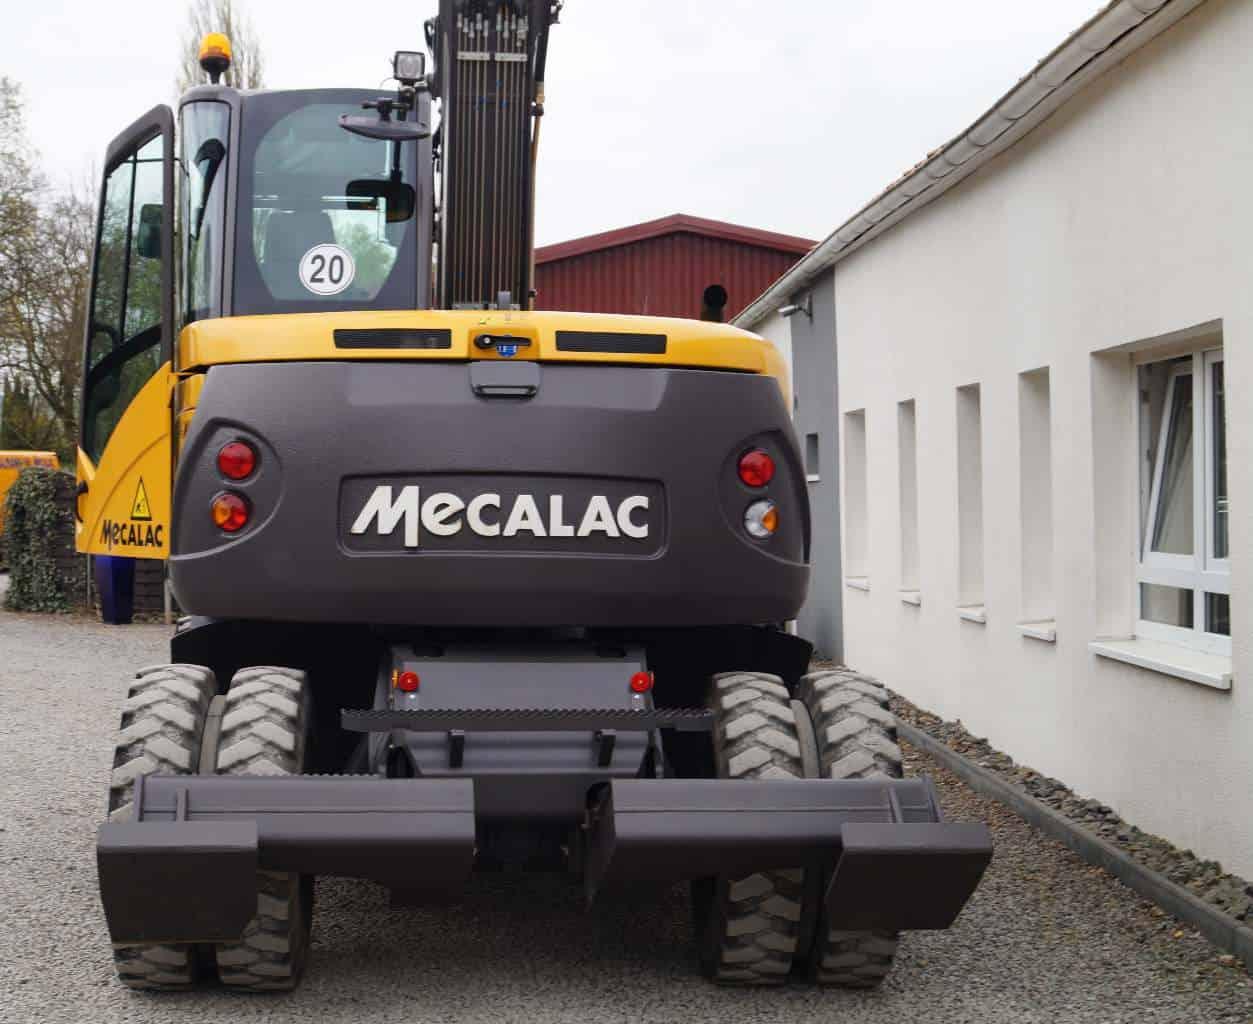 Mecalac Mobilbagger 714 MWe 714mwe Bagger gebraucht allrad allradlenkung kinematik MBN Baumaschinen